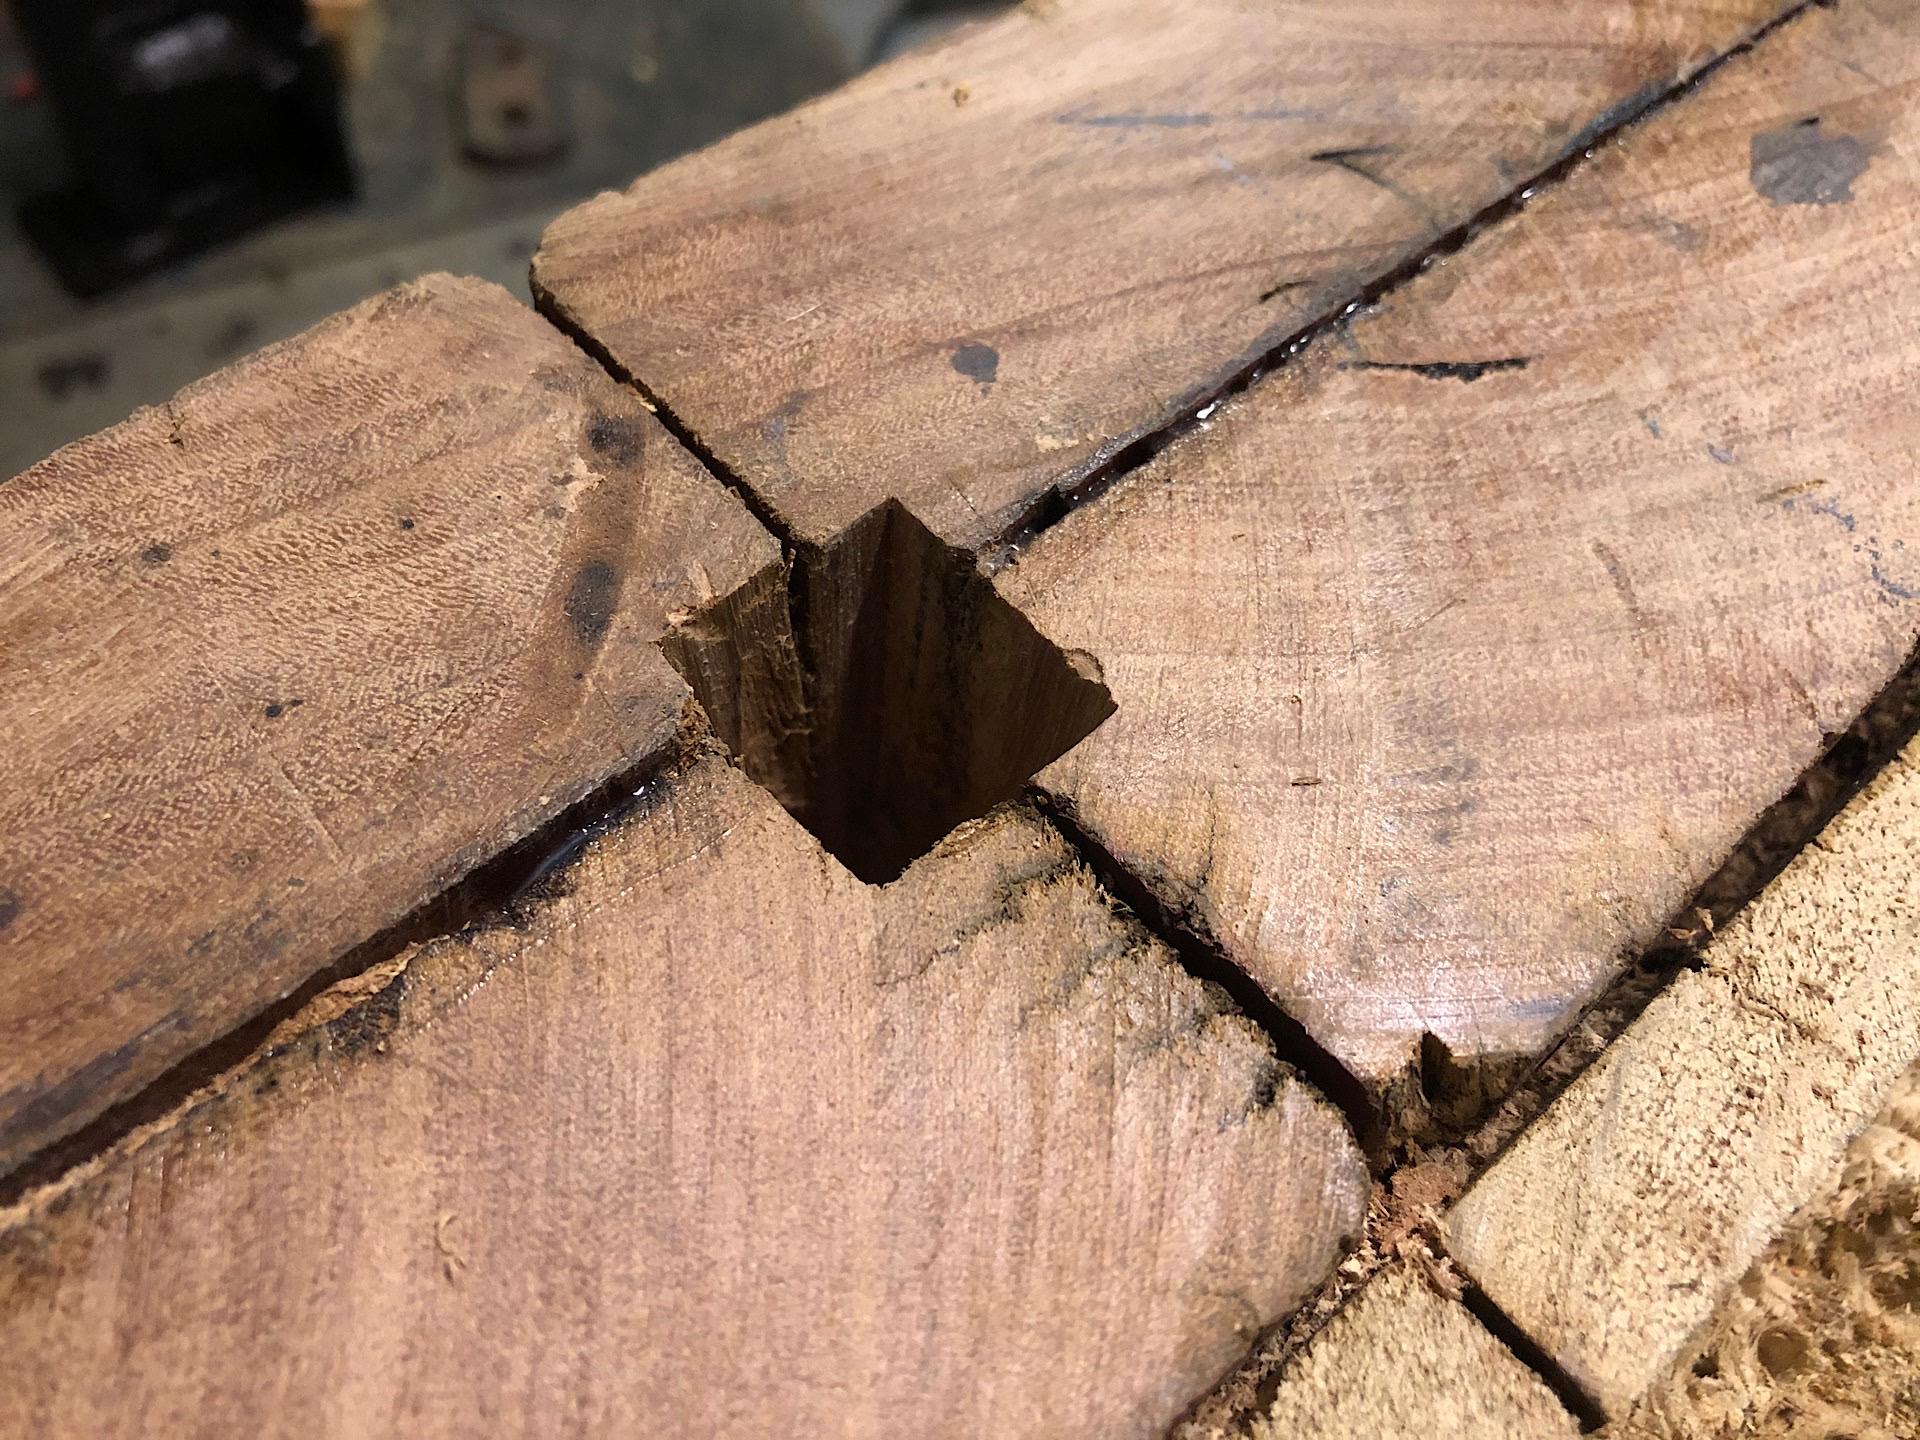 Squared hardy hole